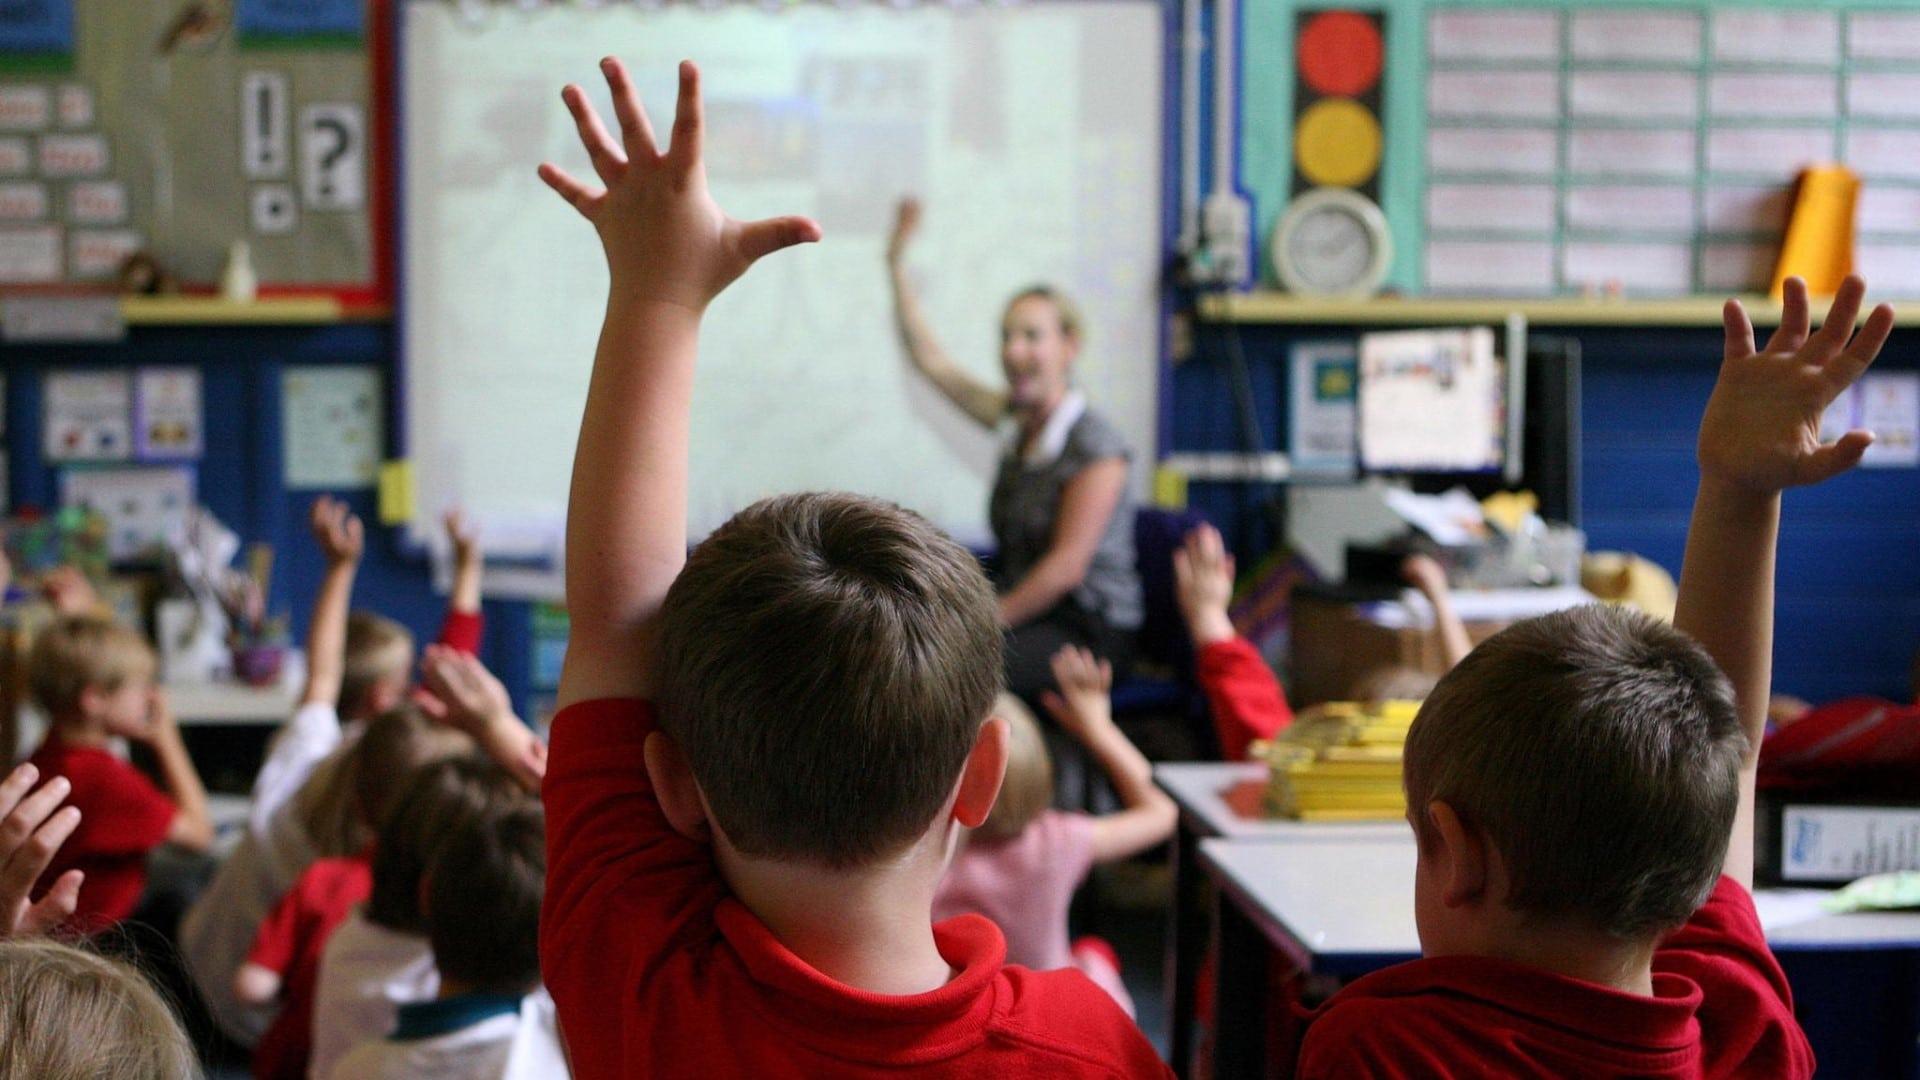 Primary Schools in Oxfordshire